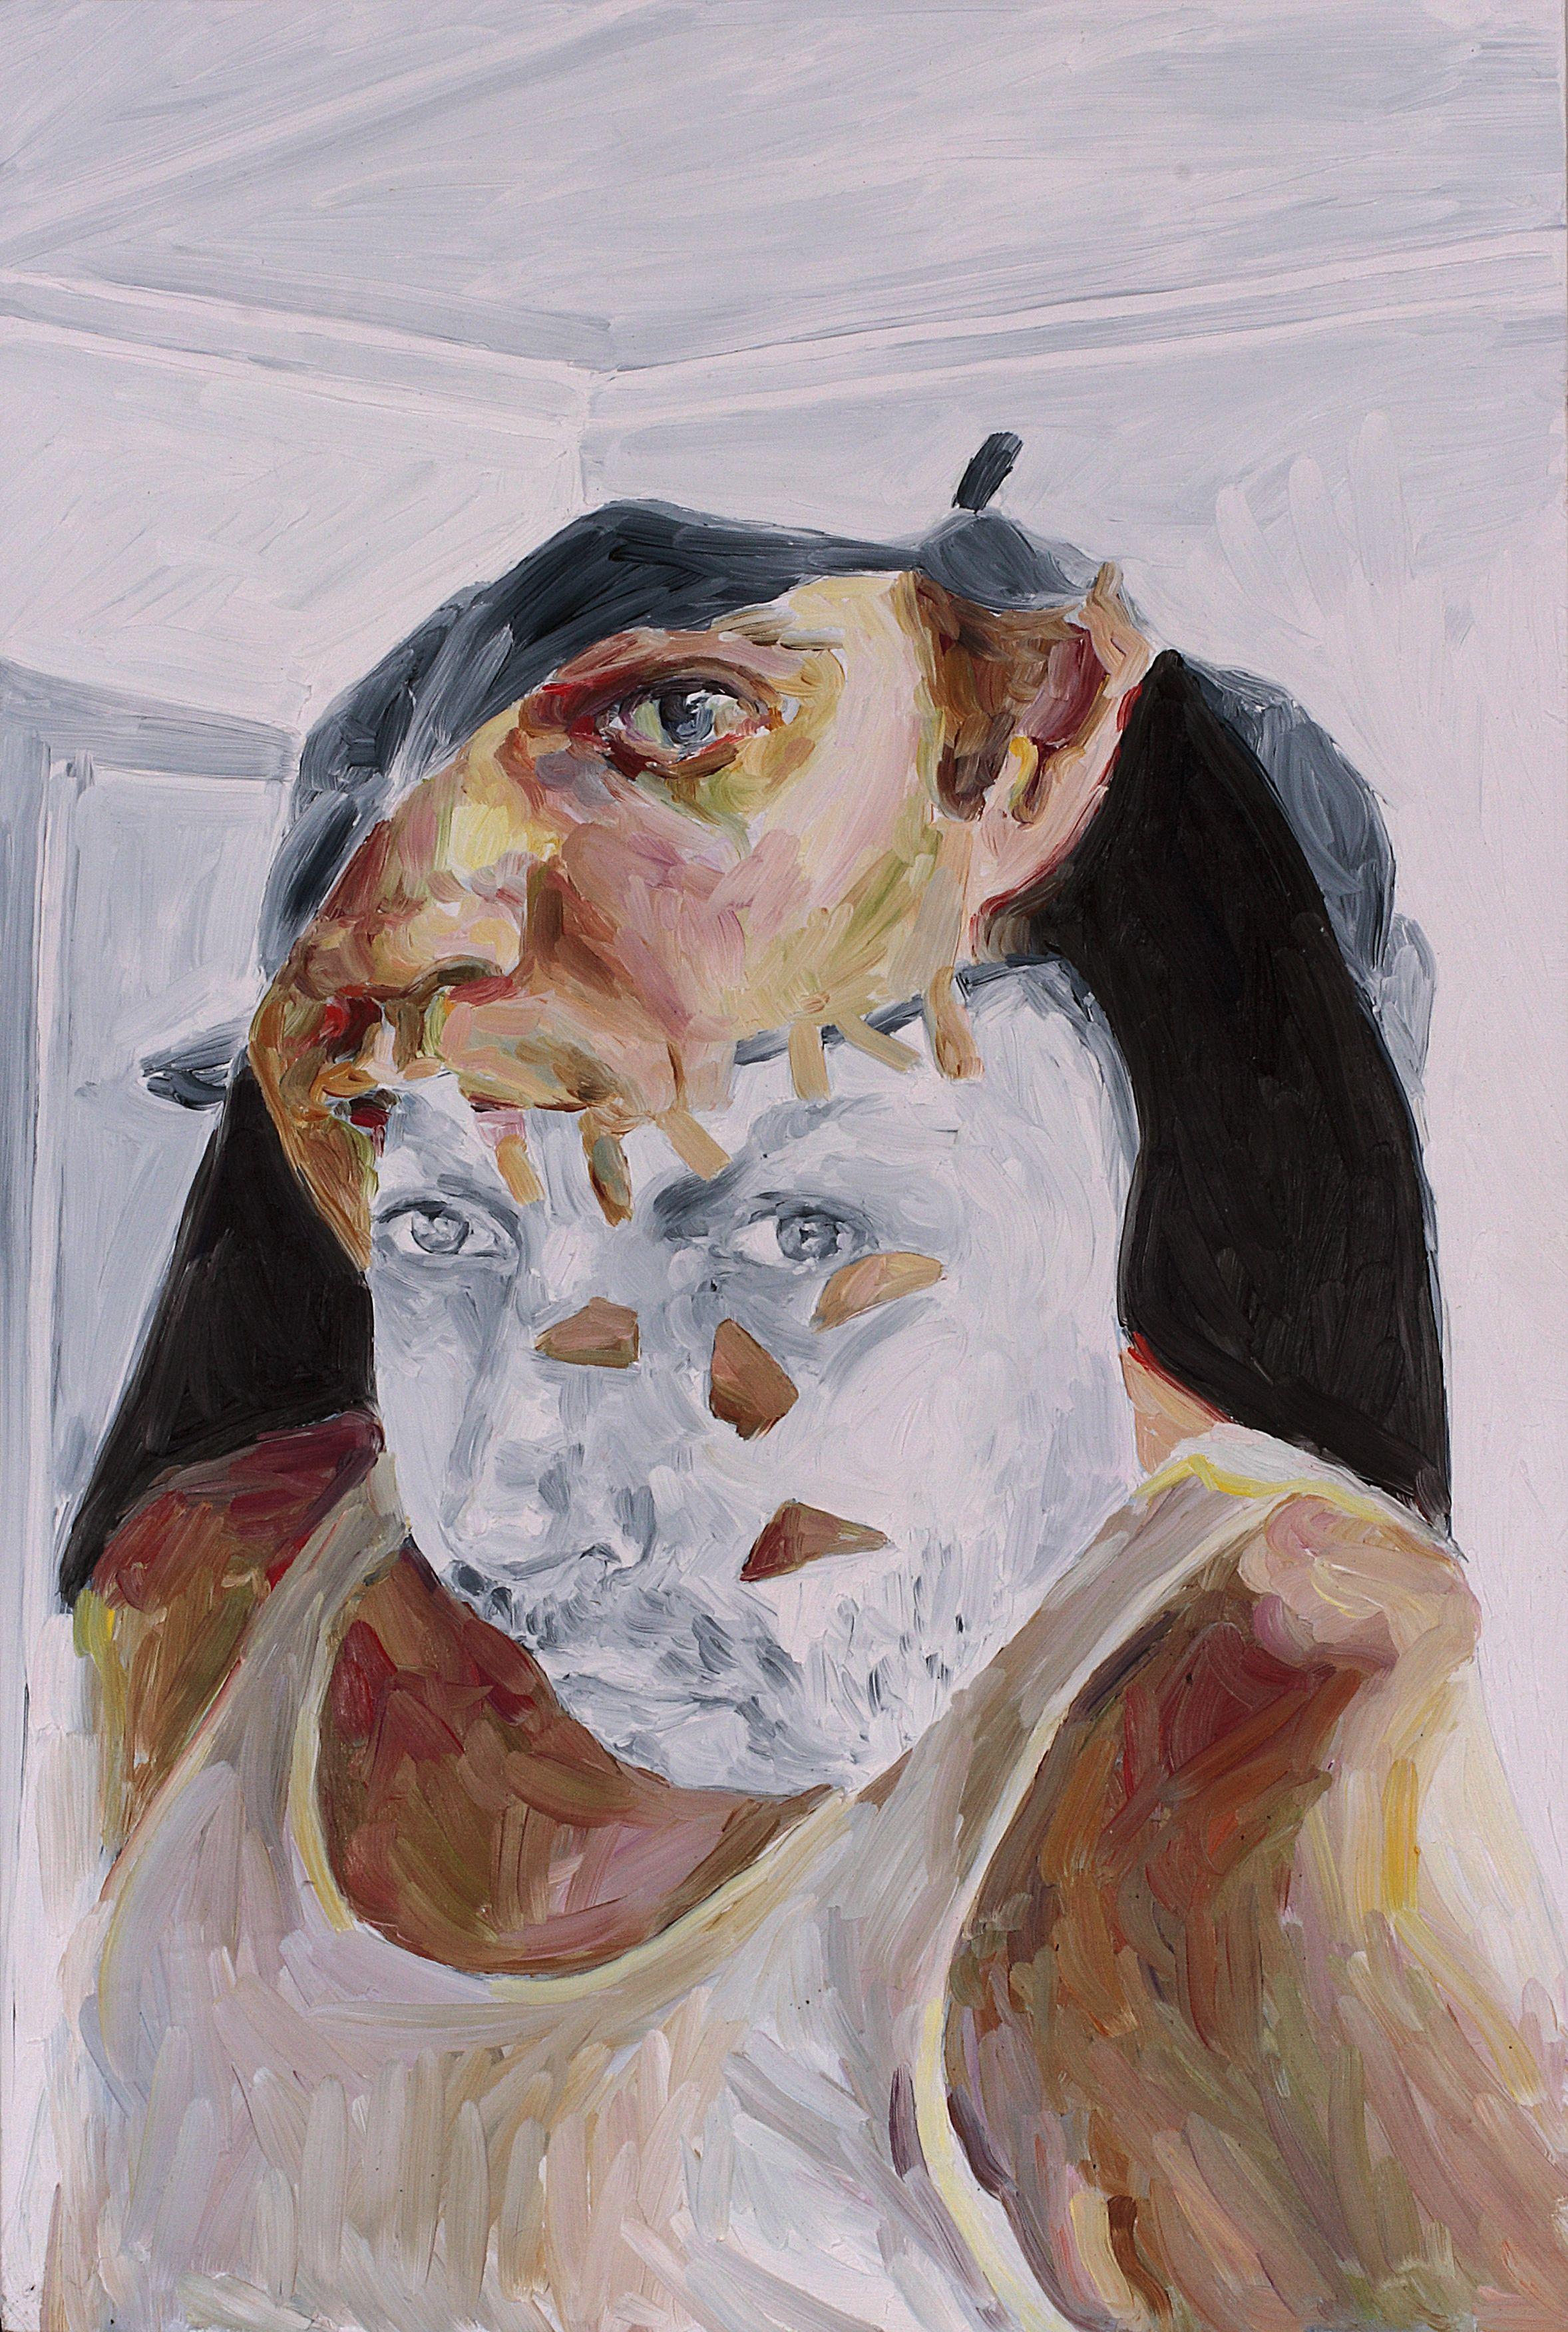 Nicholas Chambers and David M Thomas, oil on board, 60 x 40 cm, 2008.